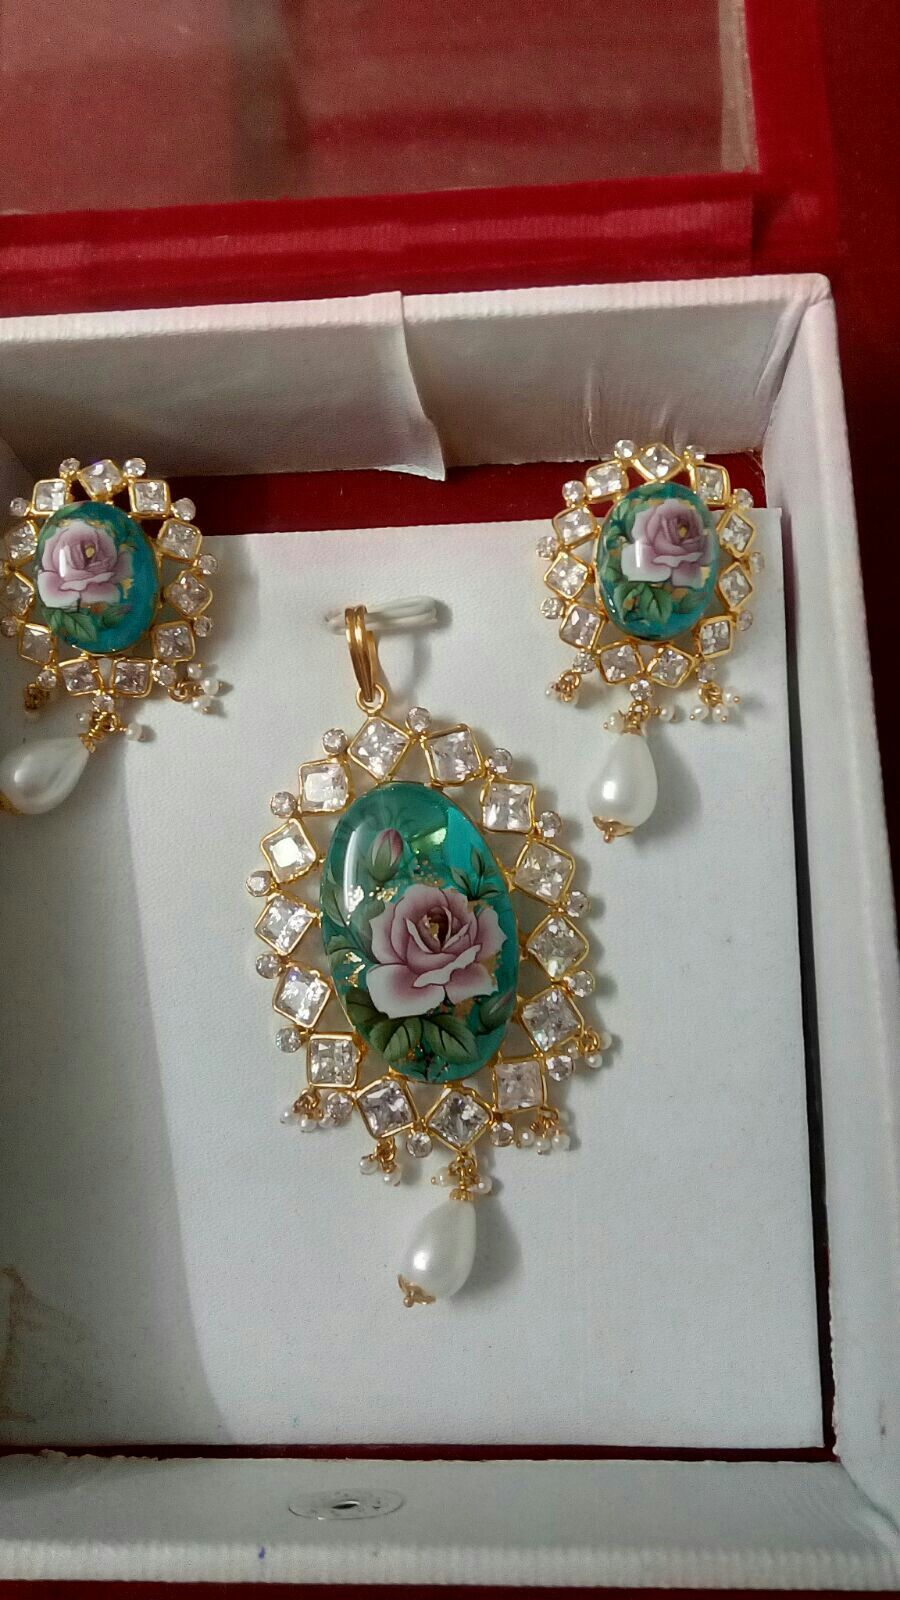 Pin by mavis mcdonald on jewelry pinterest india jewelry jewel